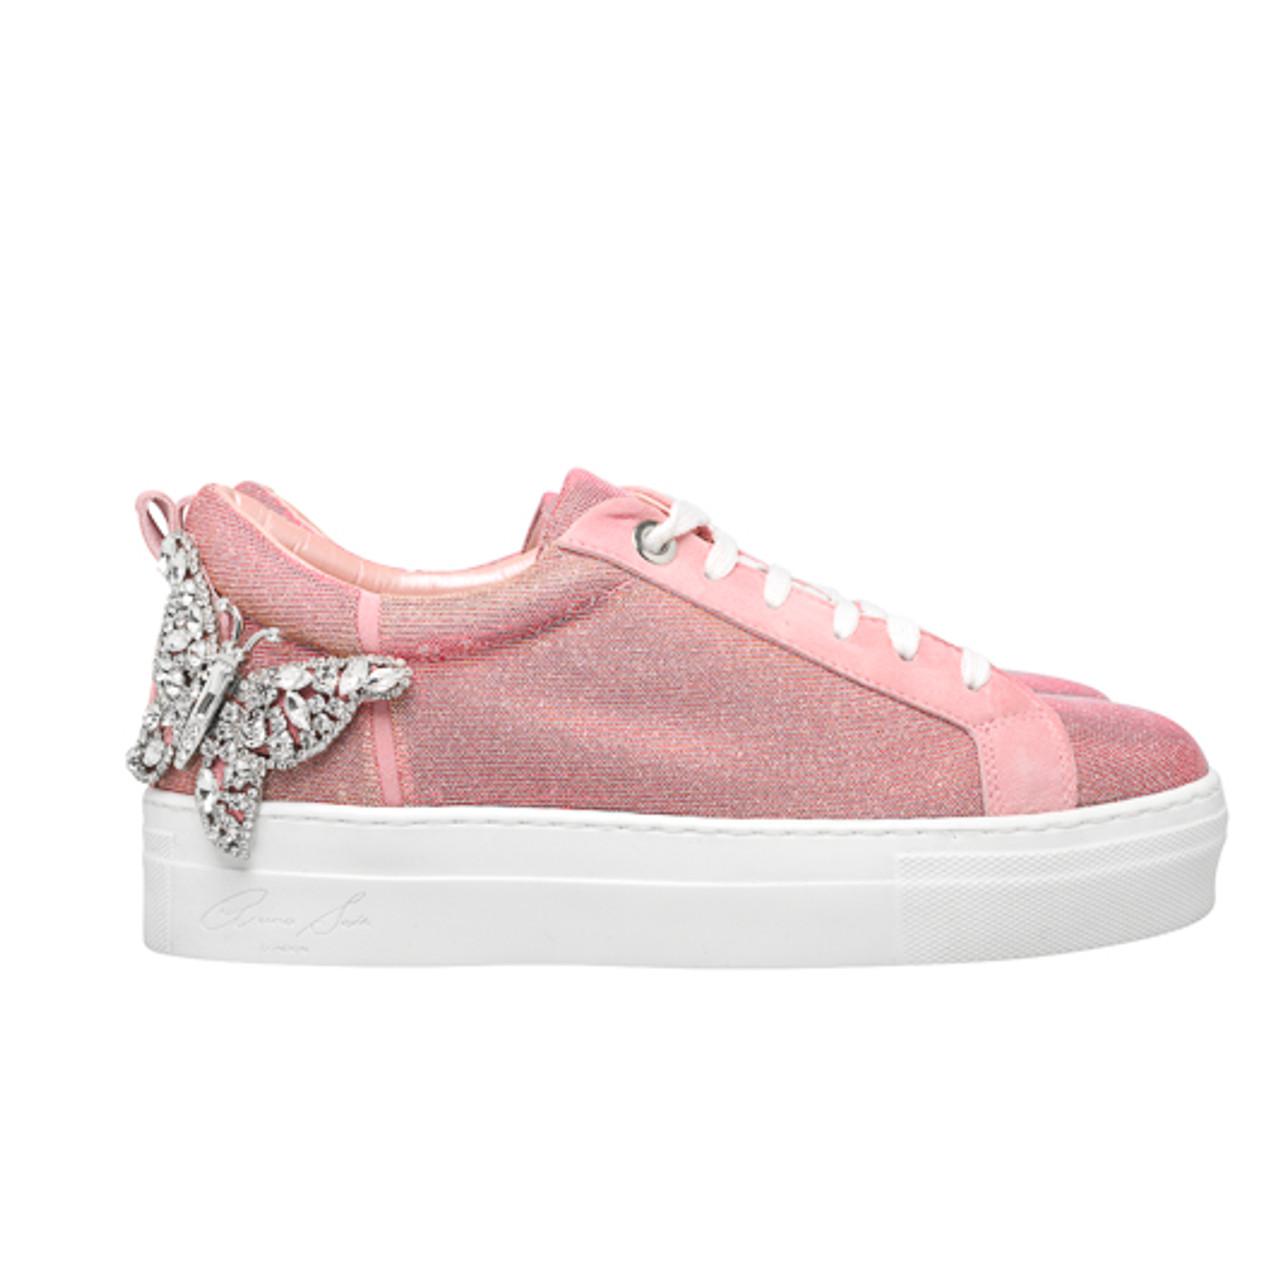 Rocket Tiffany Pink Notturno Sneakers